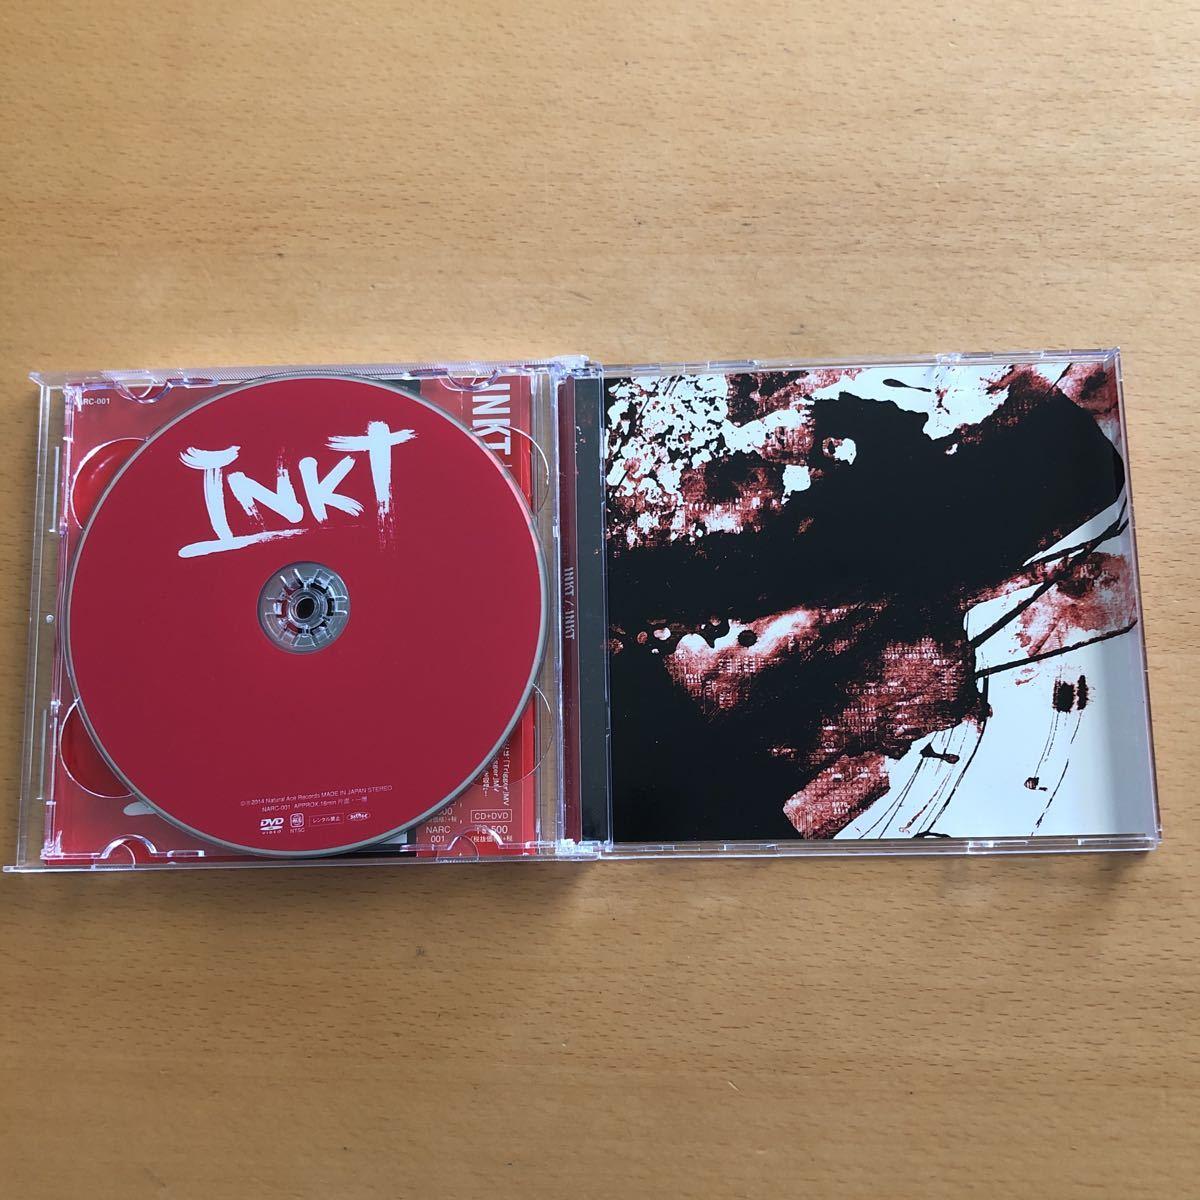 INKT『INKT』初回限定盤CD+DVD☆帯付☆美品☆アルバム☆ステッカー付☆96_画像3